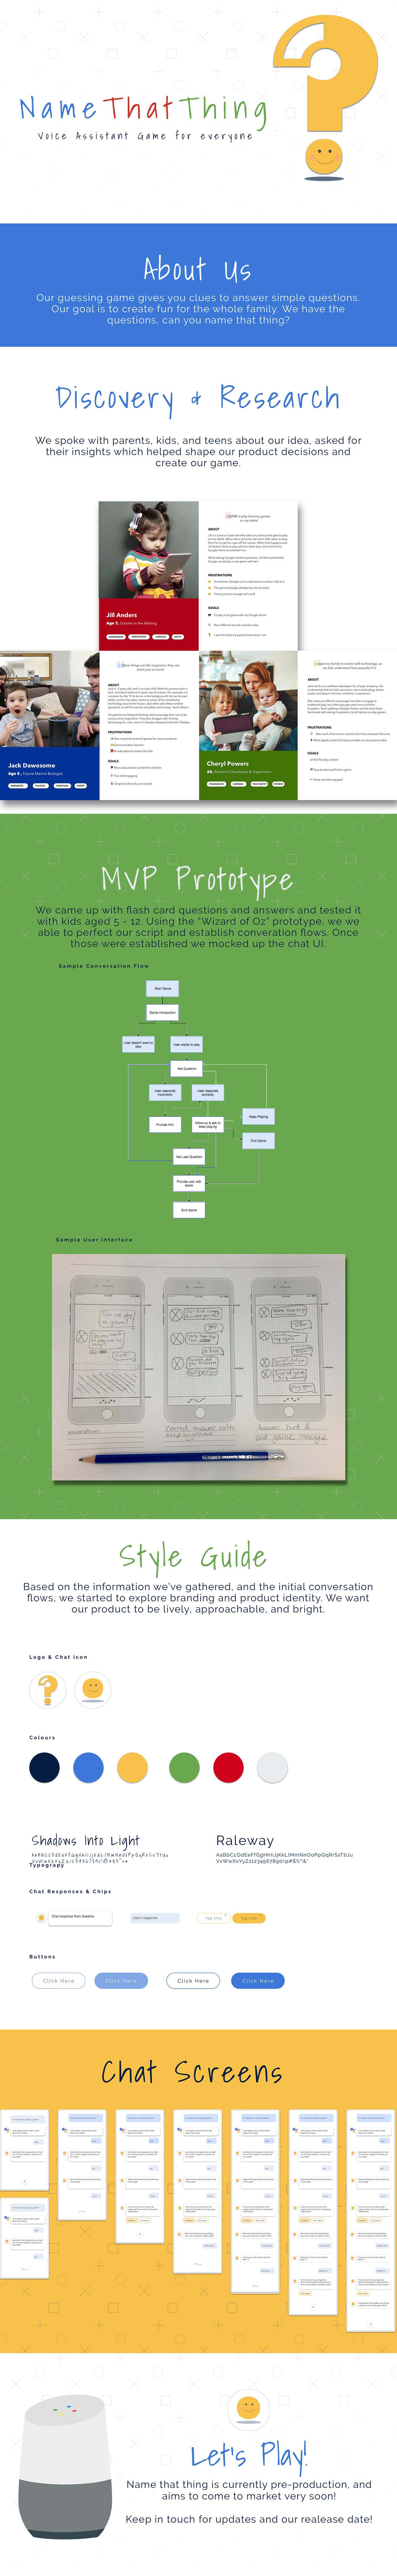 voice ui vui google action user experience user interface ai branding  graphic design